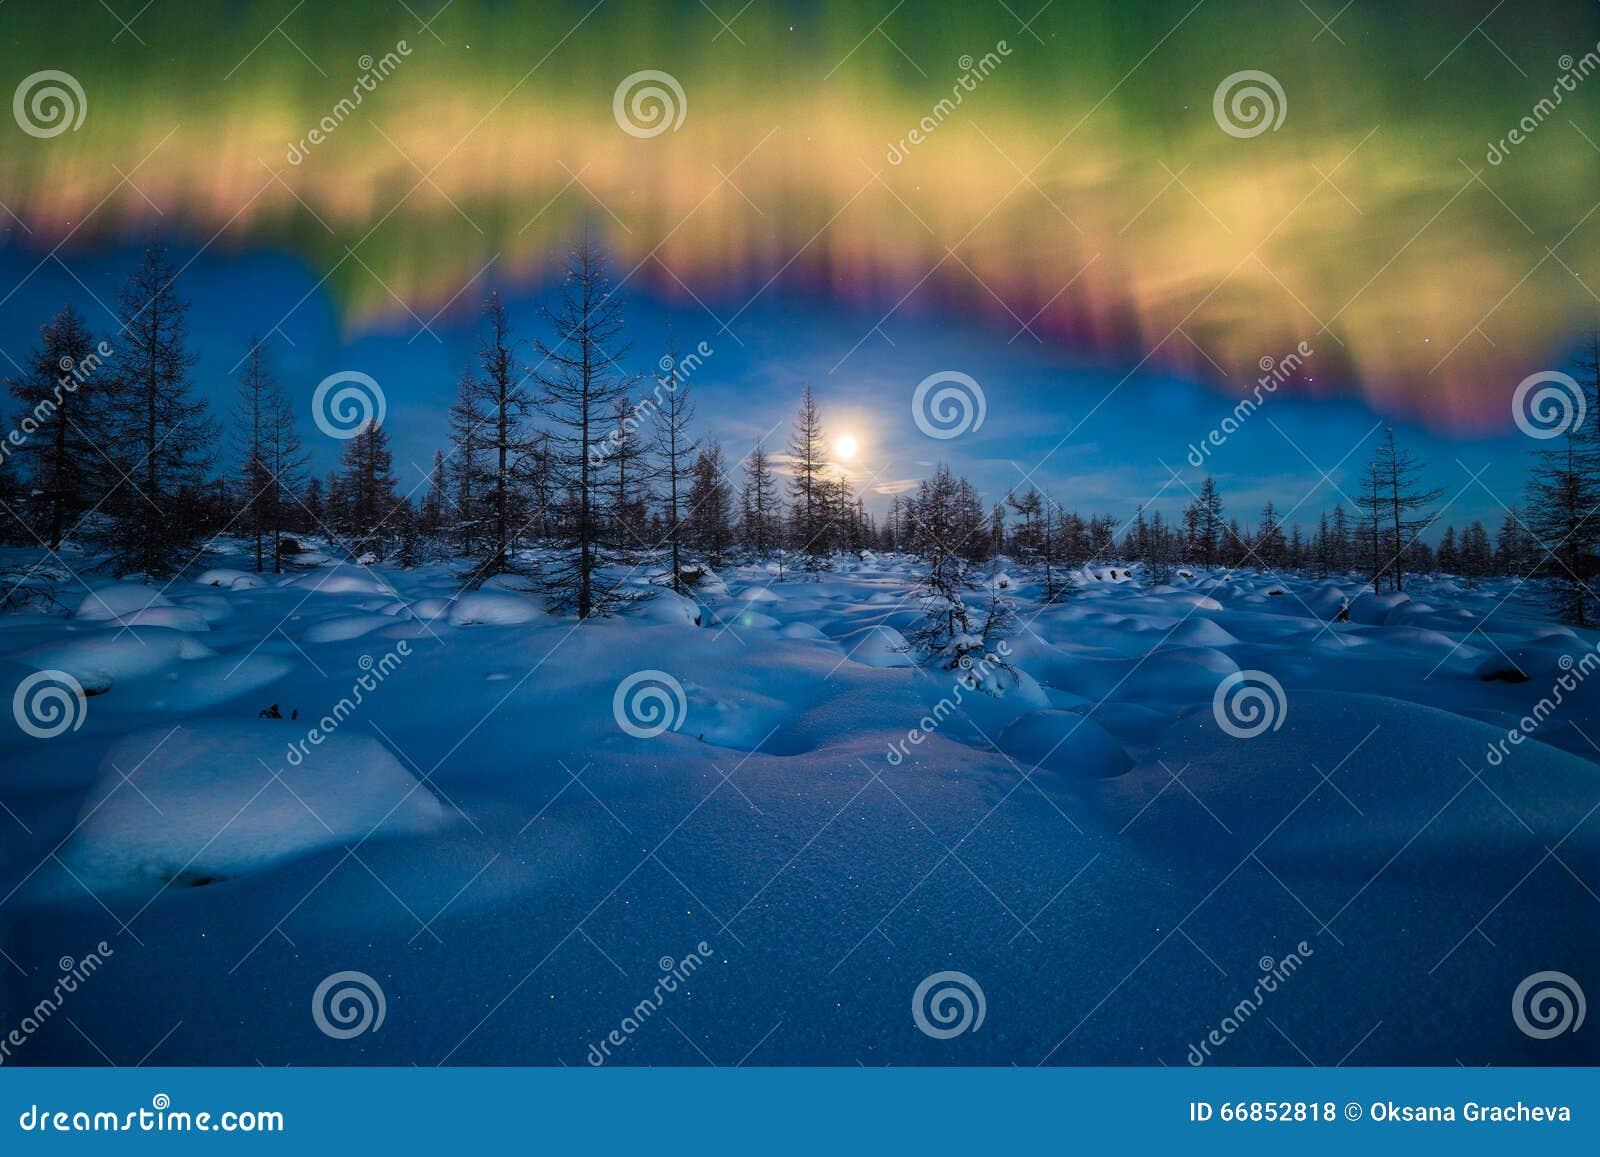 Download 冬天与森林、月亮和北极光的夜风景在森林 库存照片. 图片 包括有 月亮, 国家(地区), 建筑师, 斯堪的那维亚 - 66852818